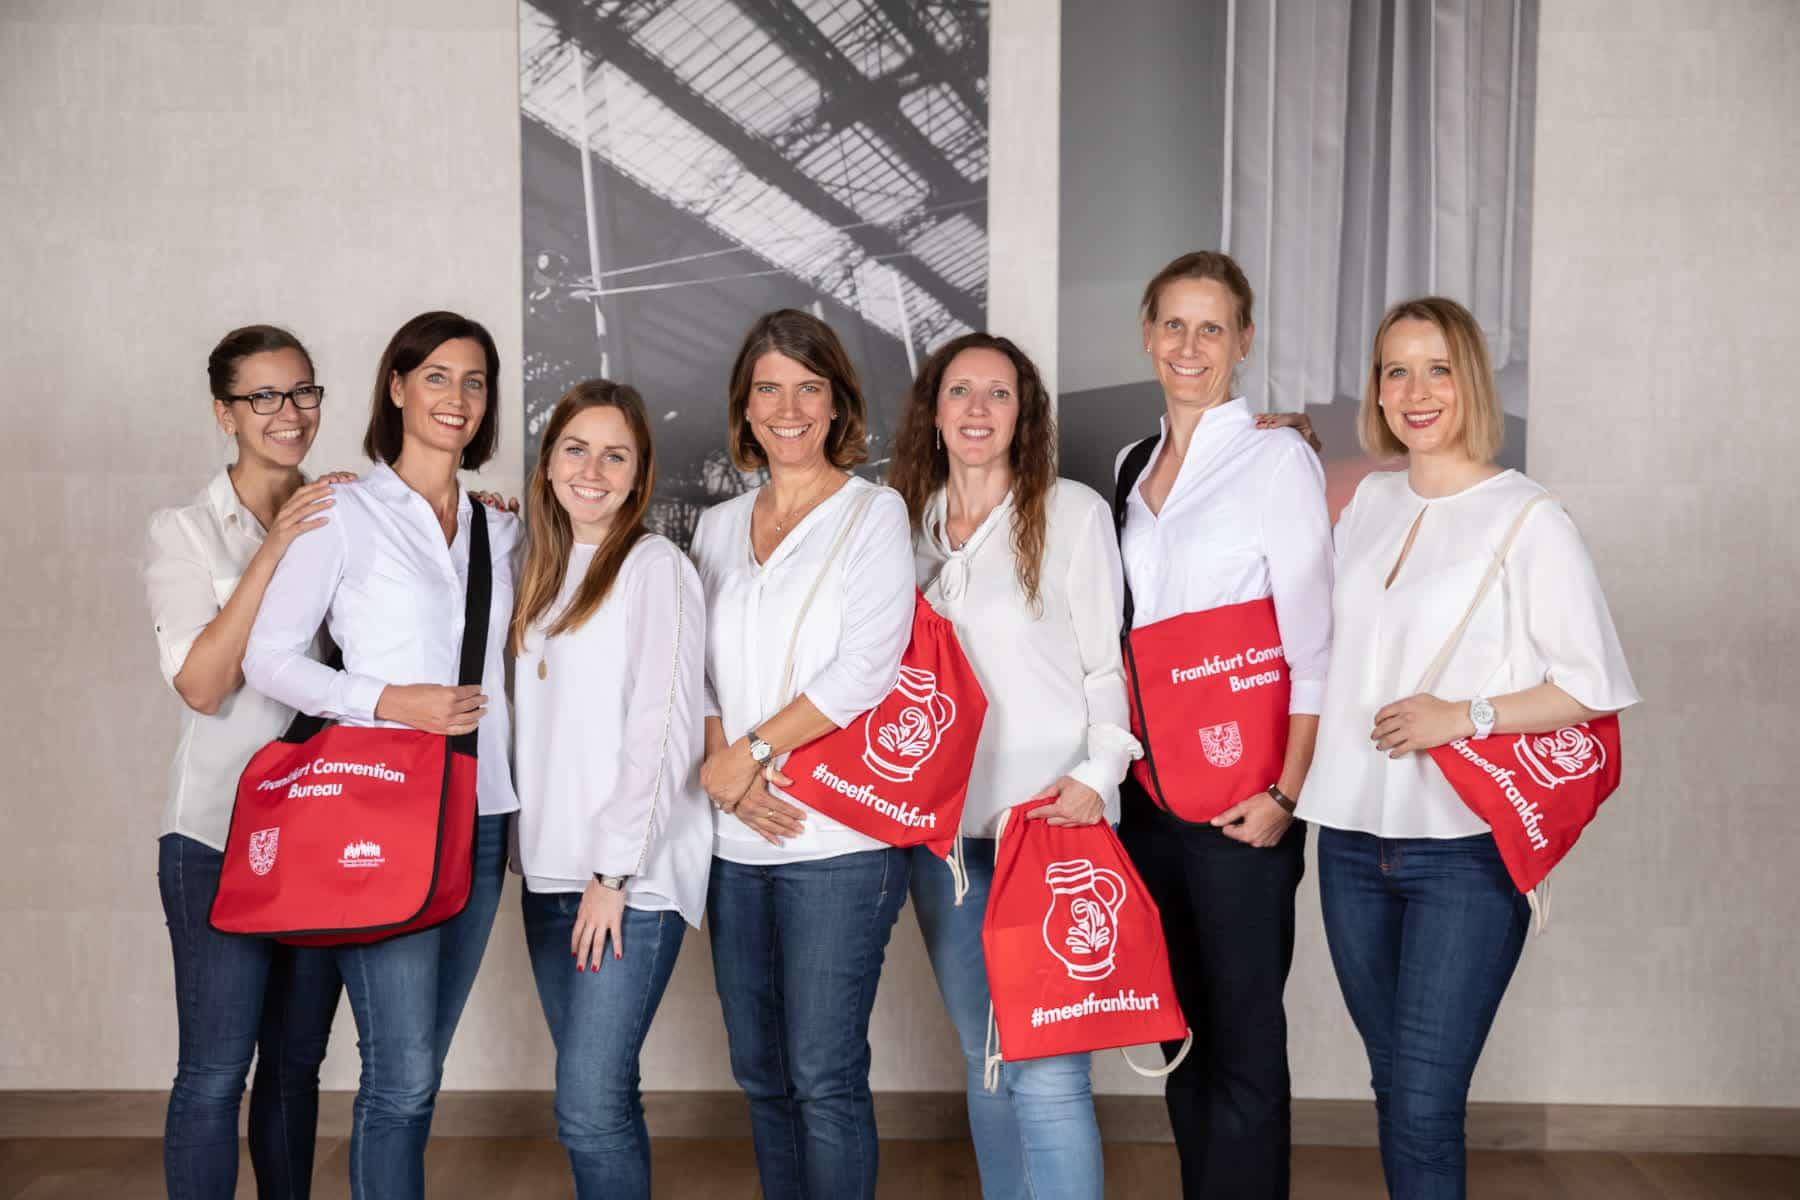 Teamfoto Powerfrauen - Frankfurt Convention Bureau